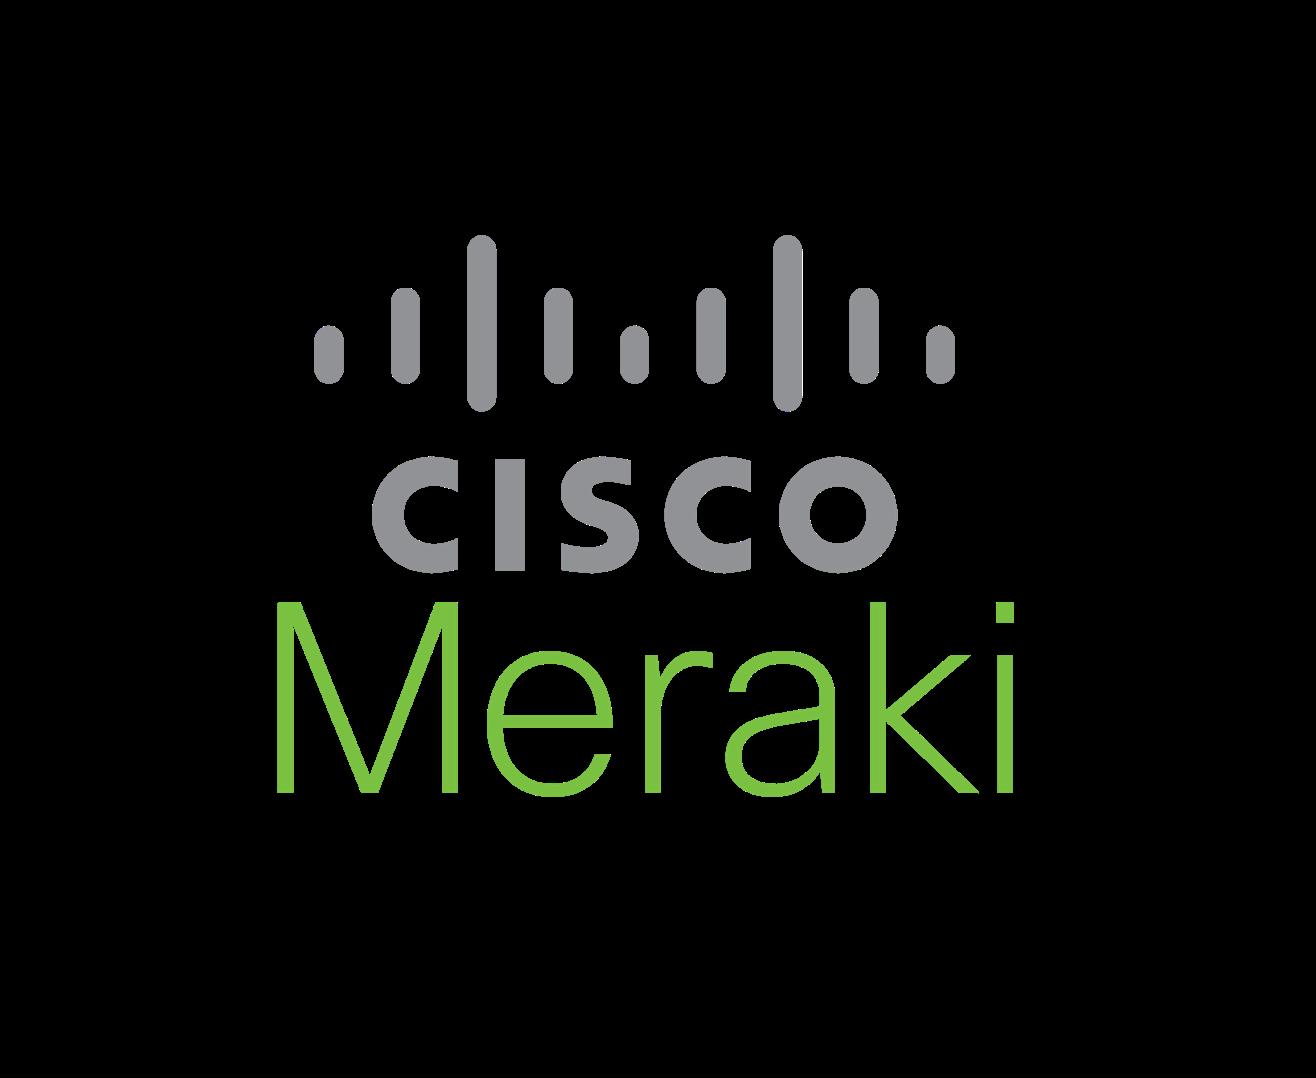 CiscoMeraki-partenaireInfrastructureDigitales-Apixit